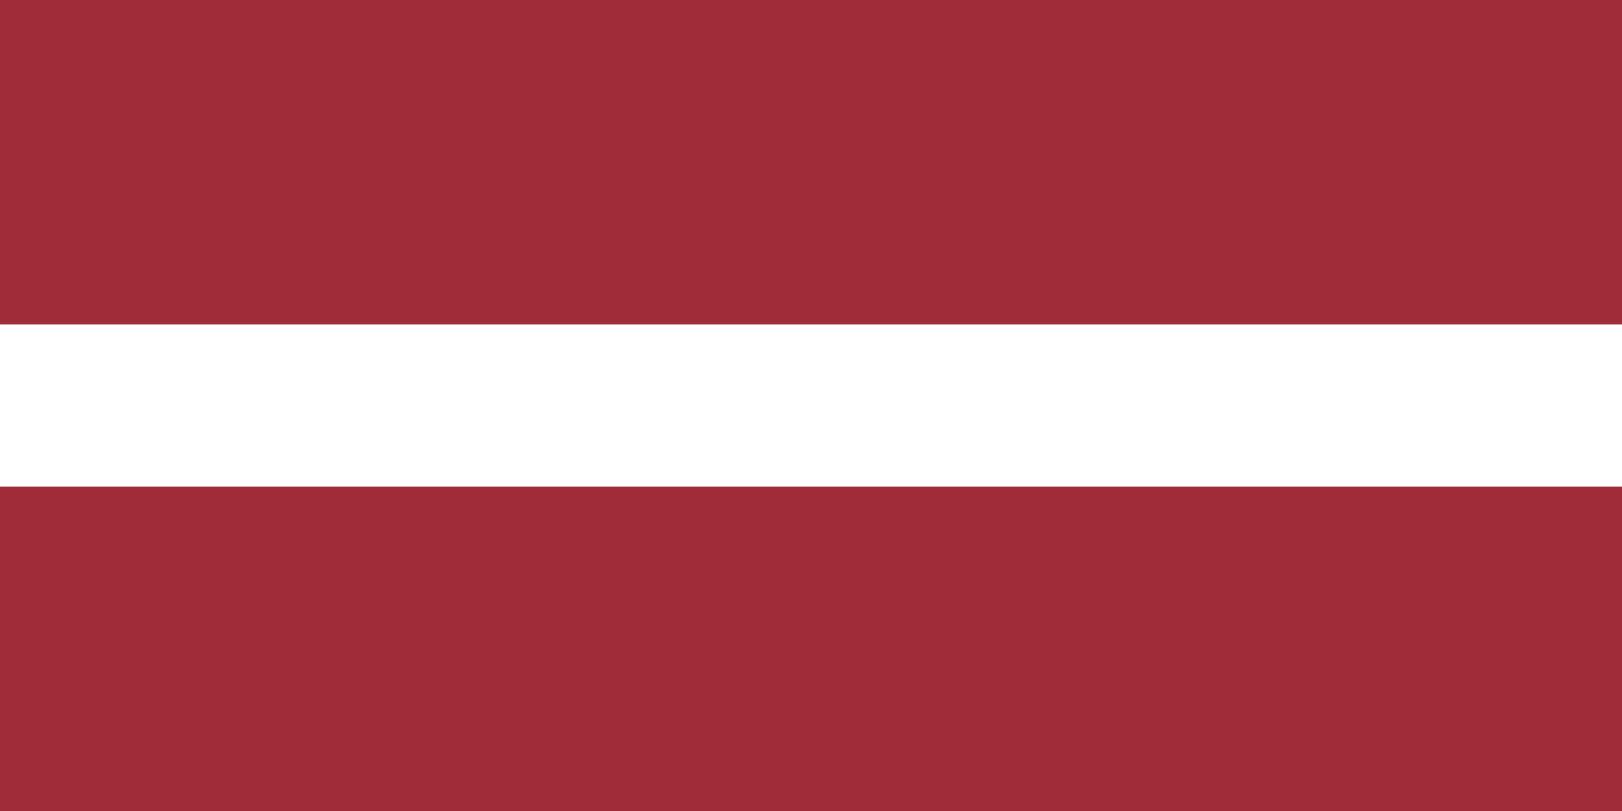 Flagge im Querformat Land Lettland 150x100 cm